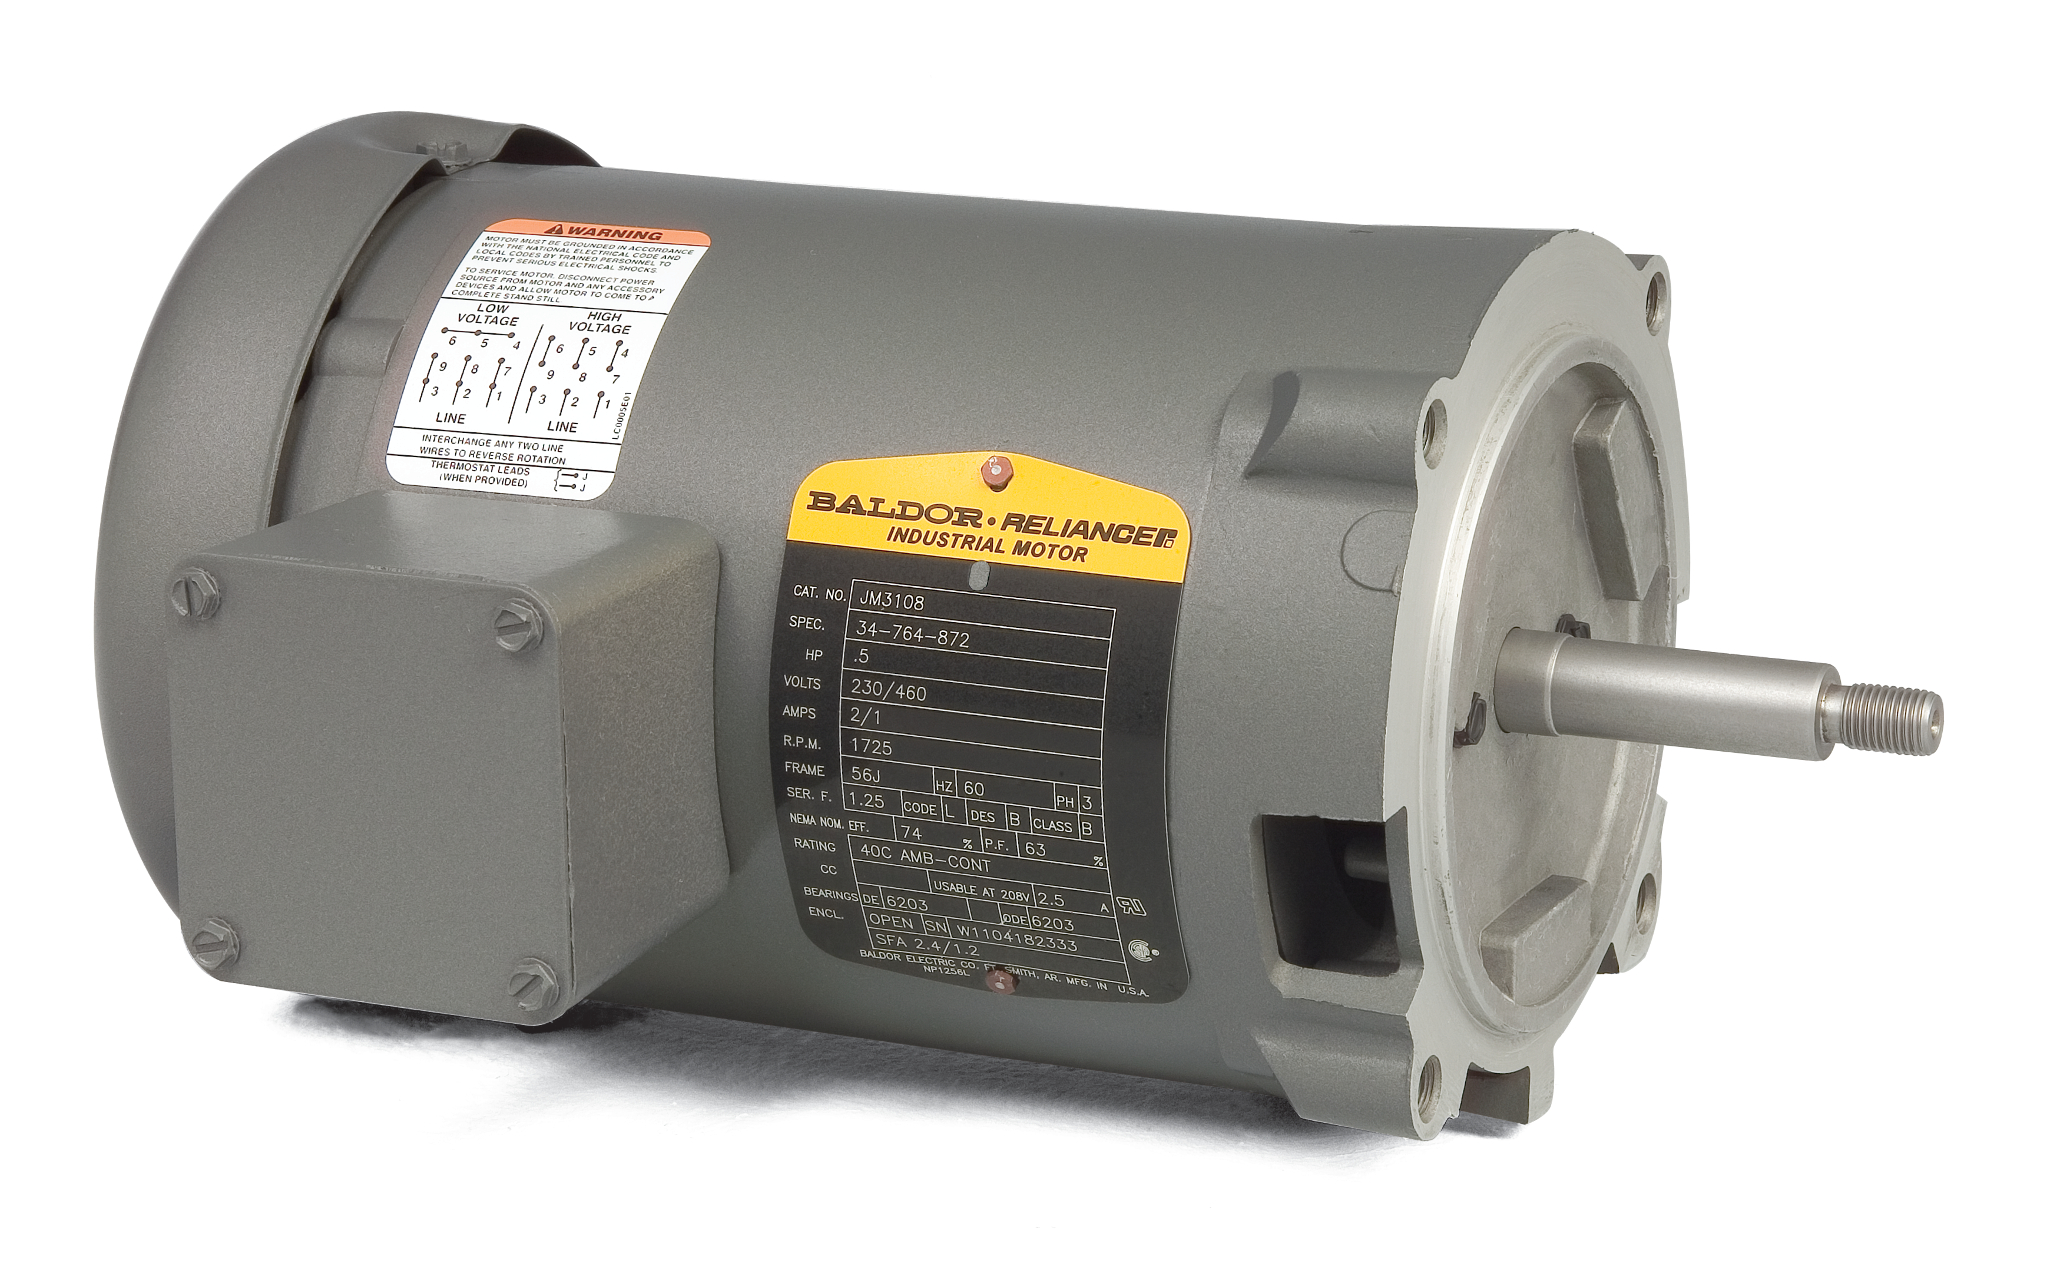 small resolution of jm3154 pump motor baldor 1 5hp 1725rpm 3ph 60hz 56j 3520m open f1 3 phase motor wiring diagrams wiring diagram baldor 2 hp single phase motor